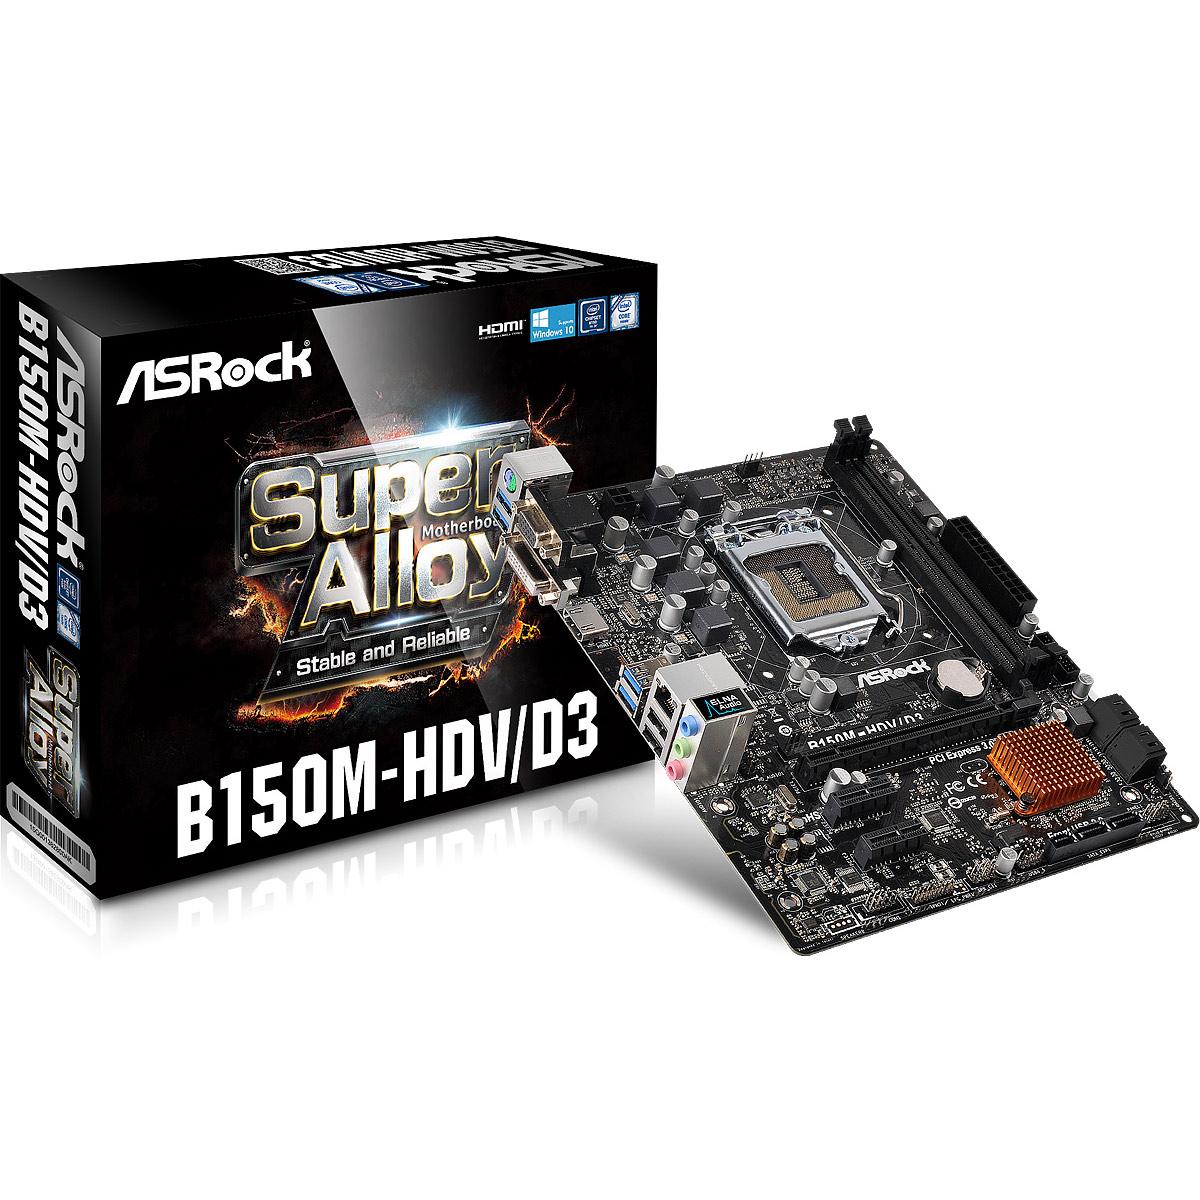 Carte mère ASRock B150M-HDV/D3 Carte mère Micro ATX Socket 1151 Intel B150 Express - SATA 6Gb/s - SATA Express - USB 3.0 - DDR3 - 1x PCI-Express 3.0 16x